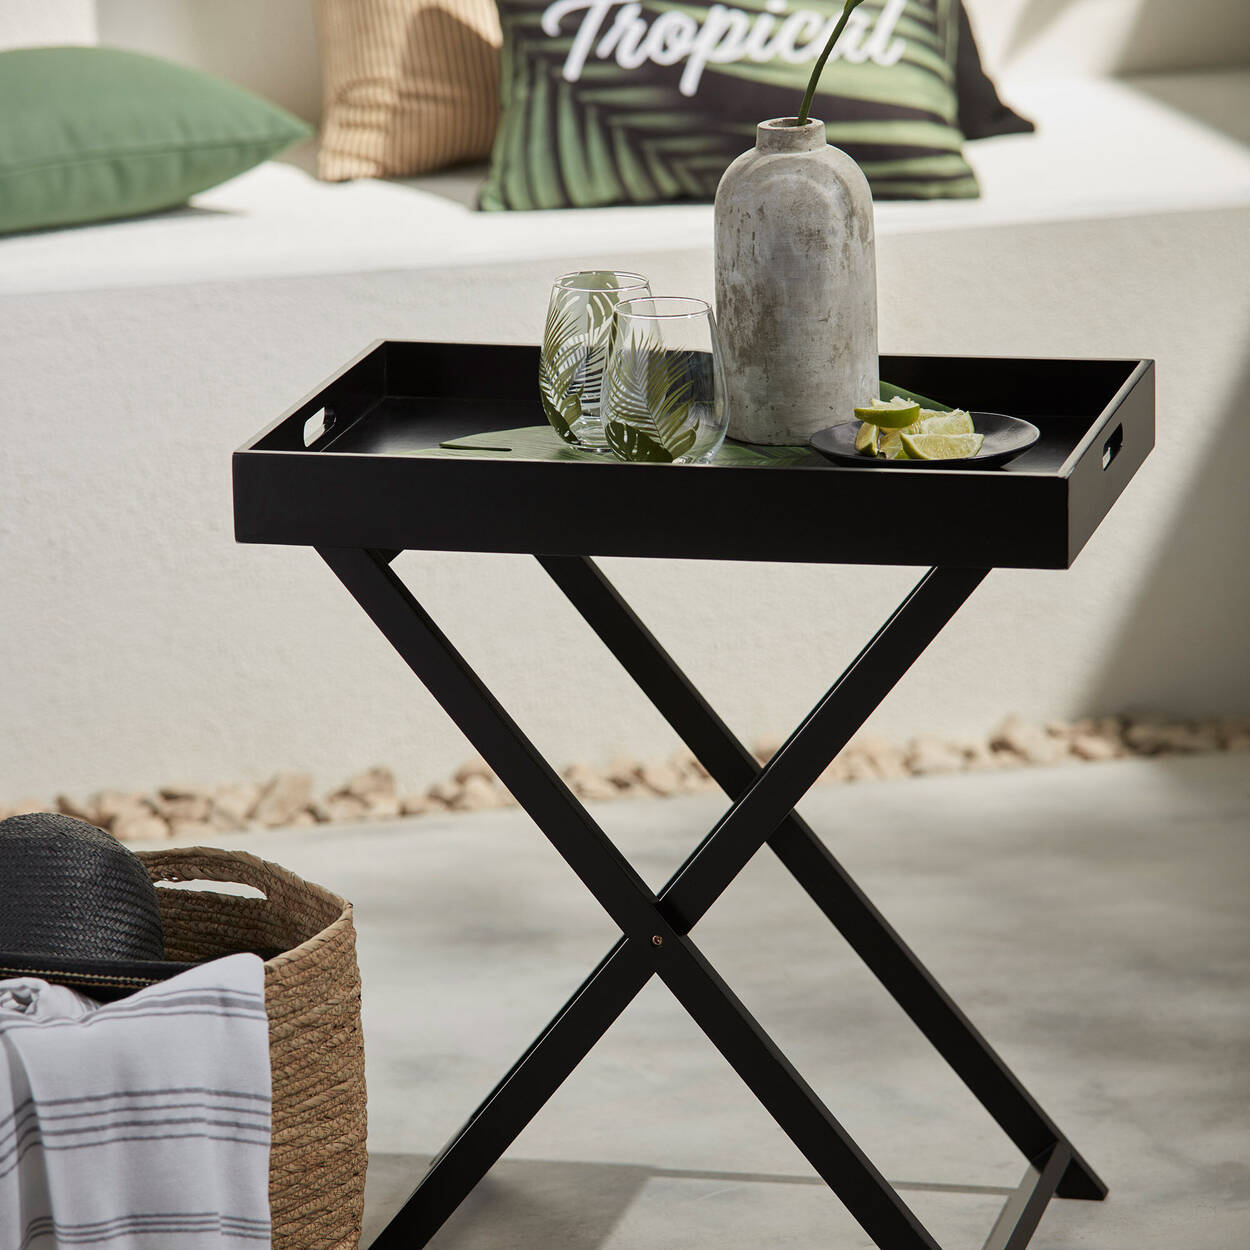 Table-plateau pliante